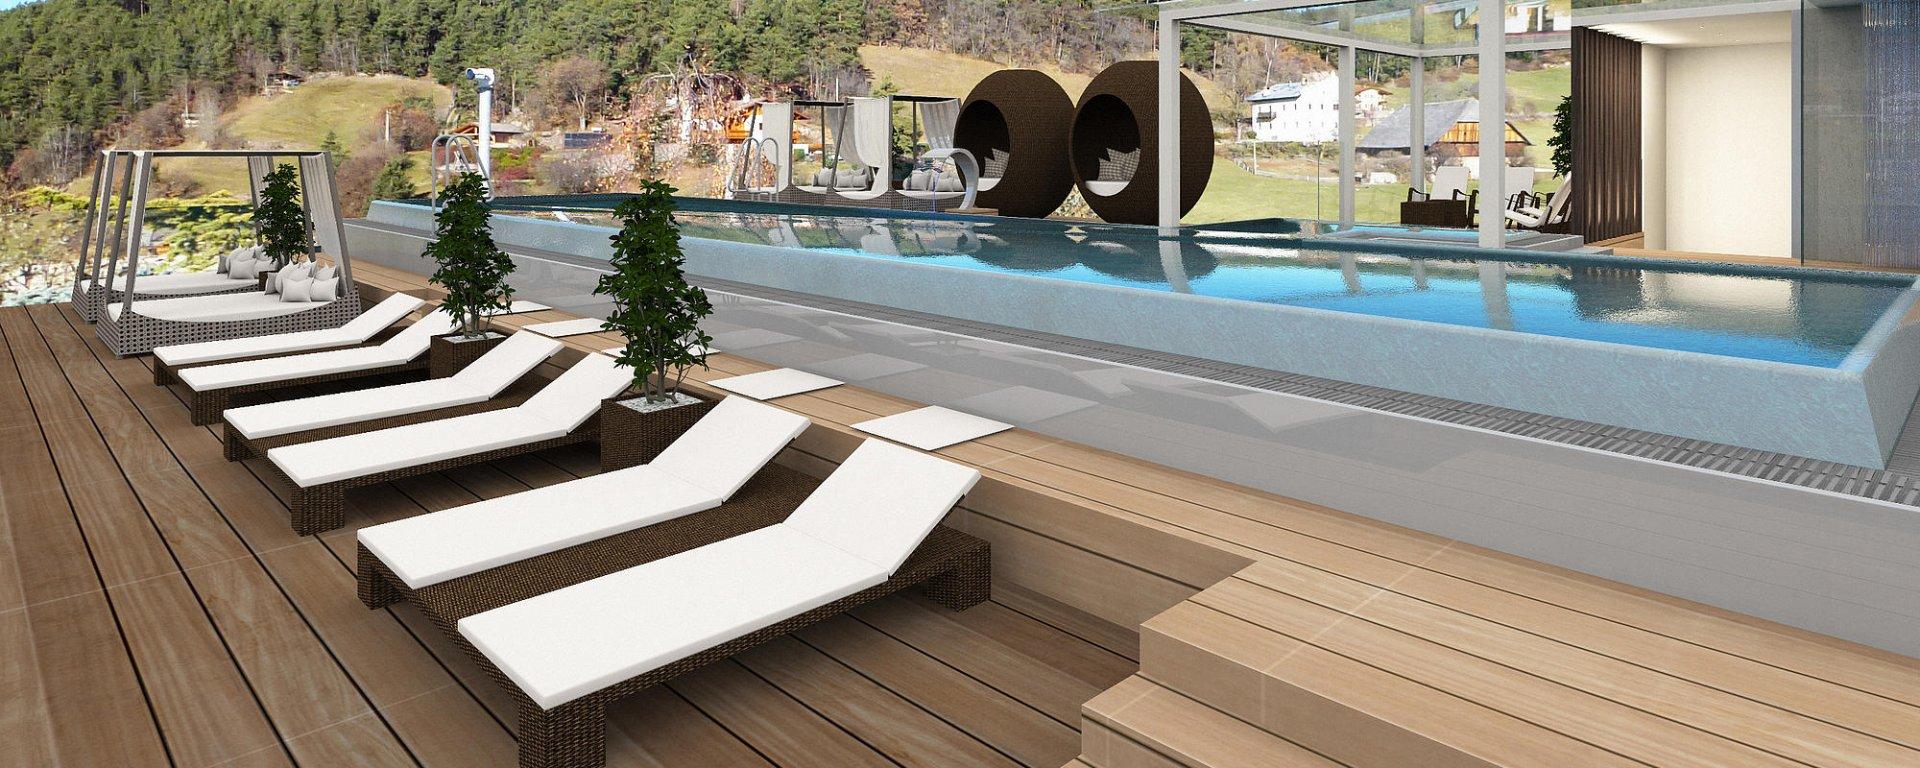 piscina Infinity sky Abinea Hotel